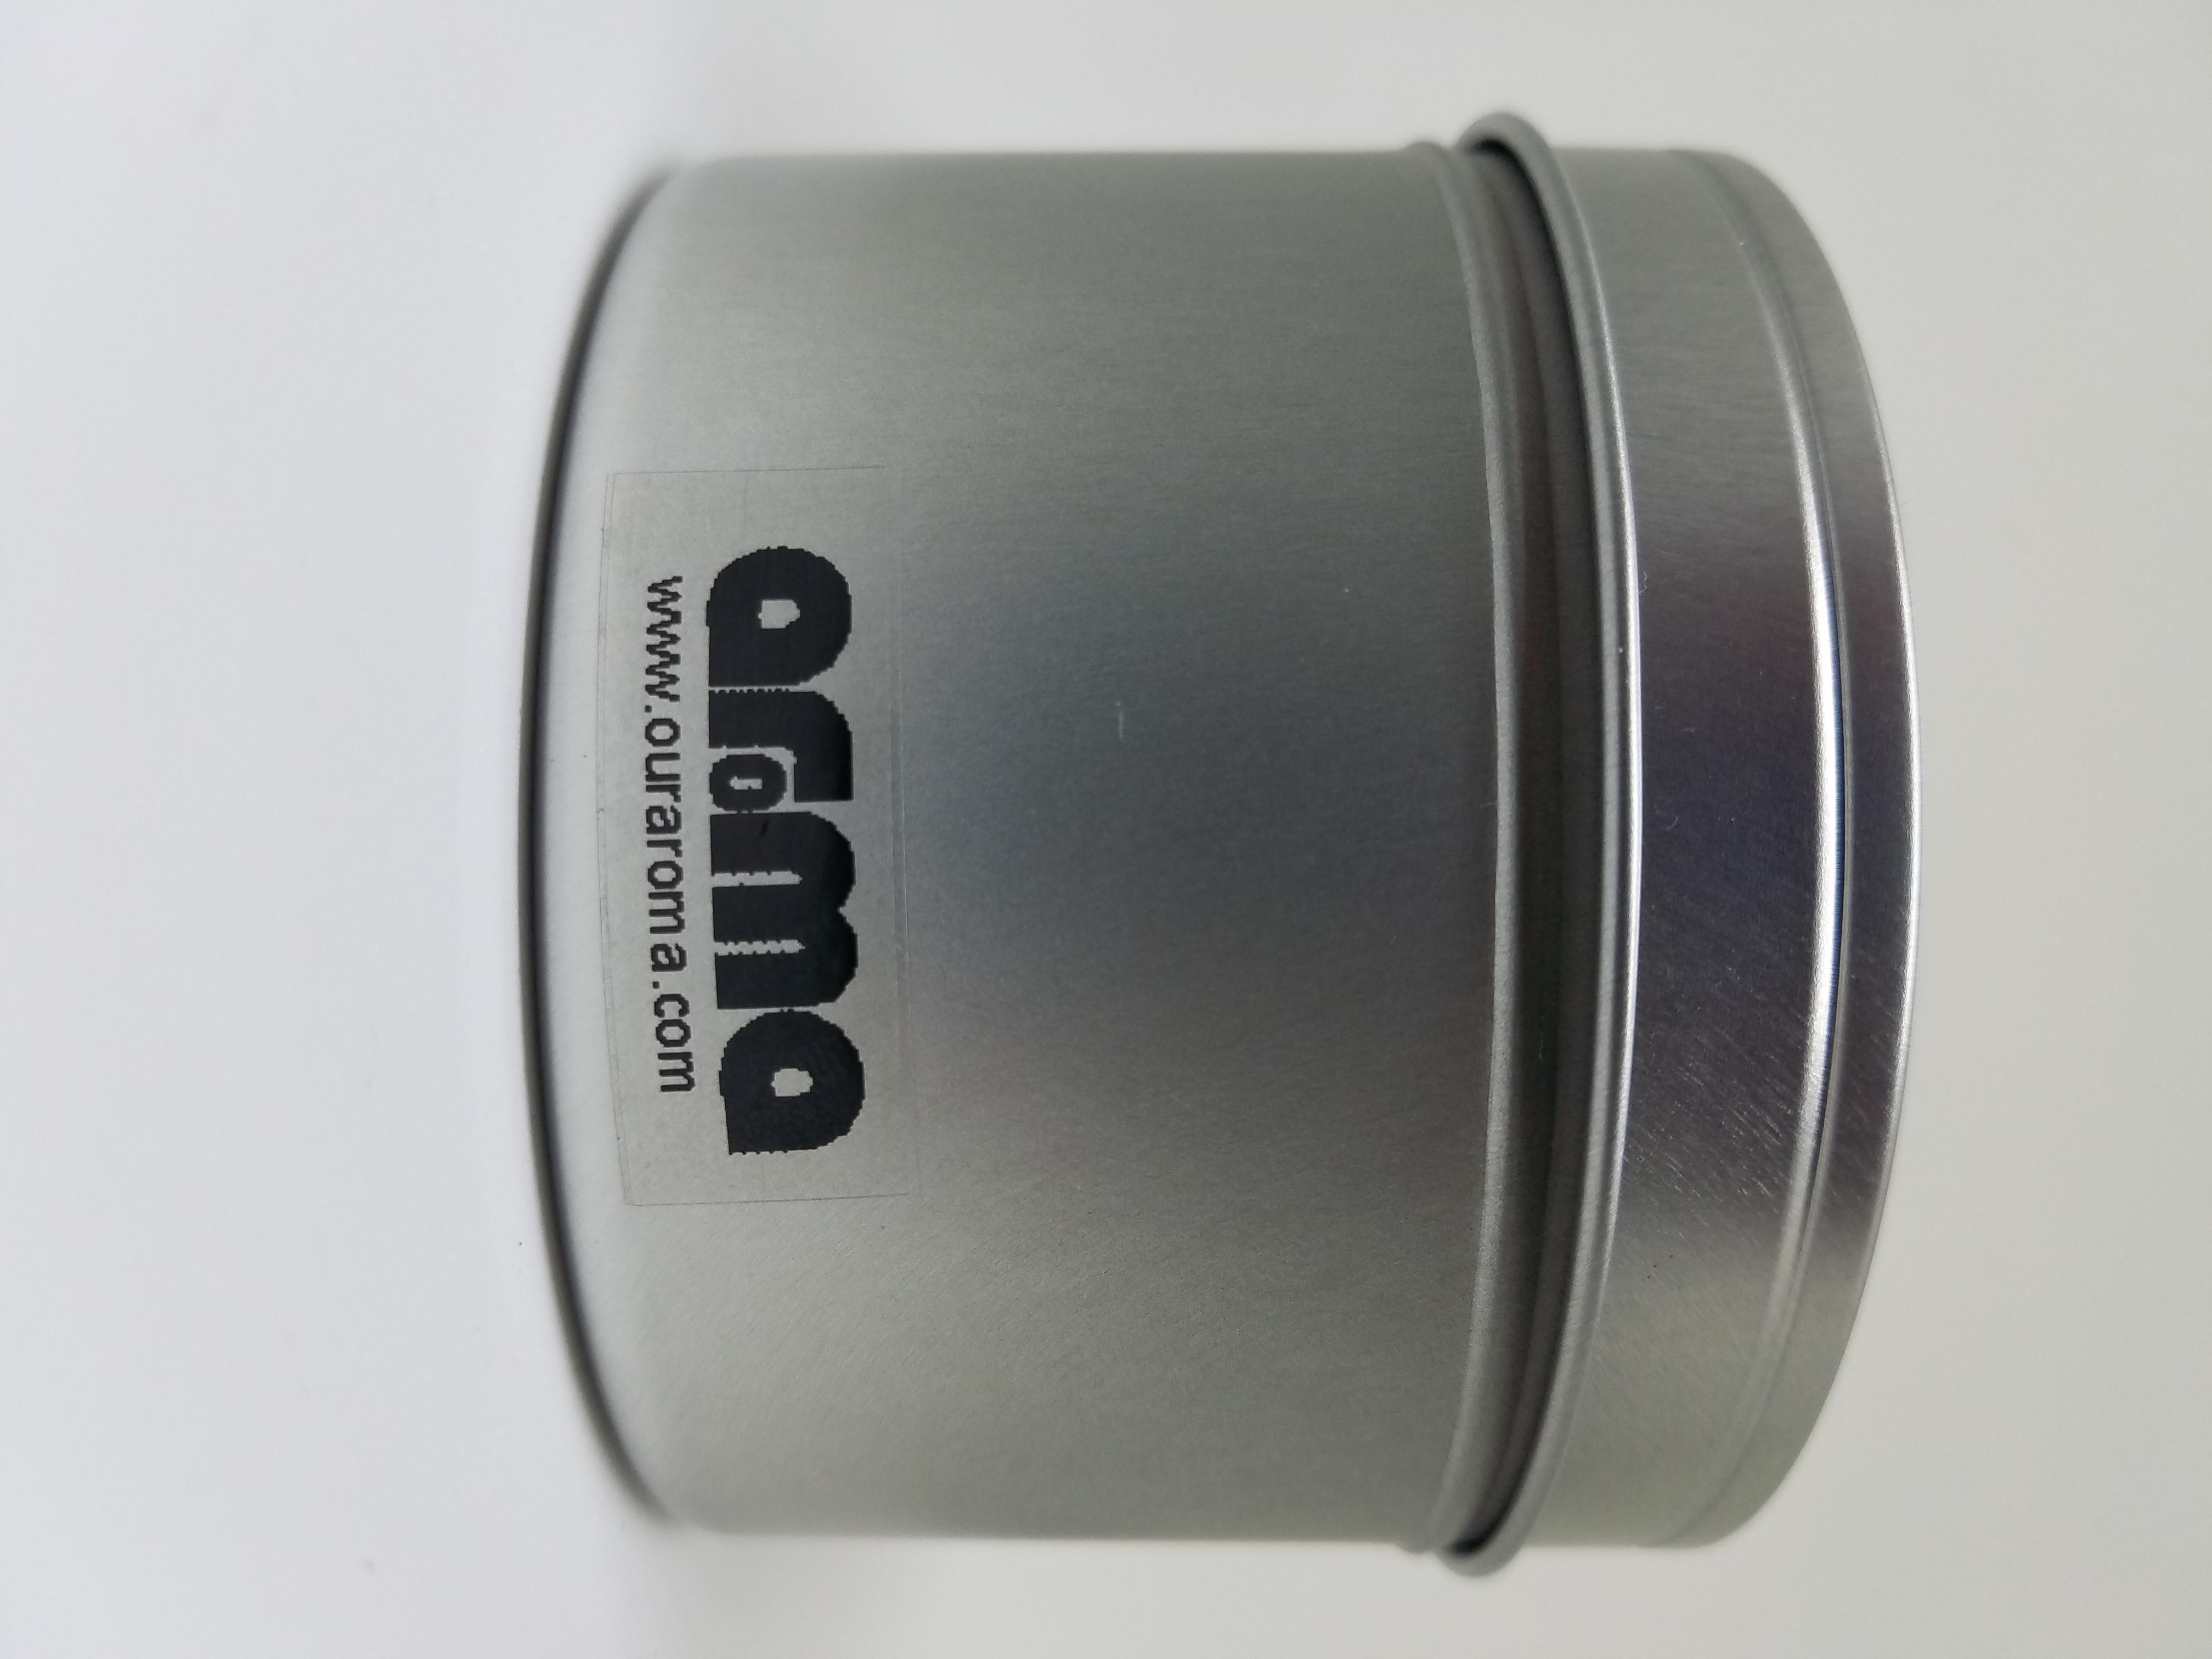 Aroma 8 Oz Candle